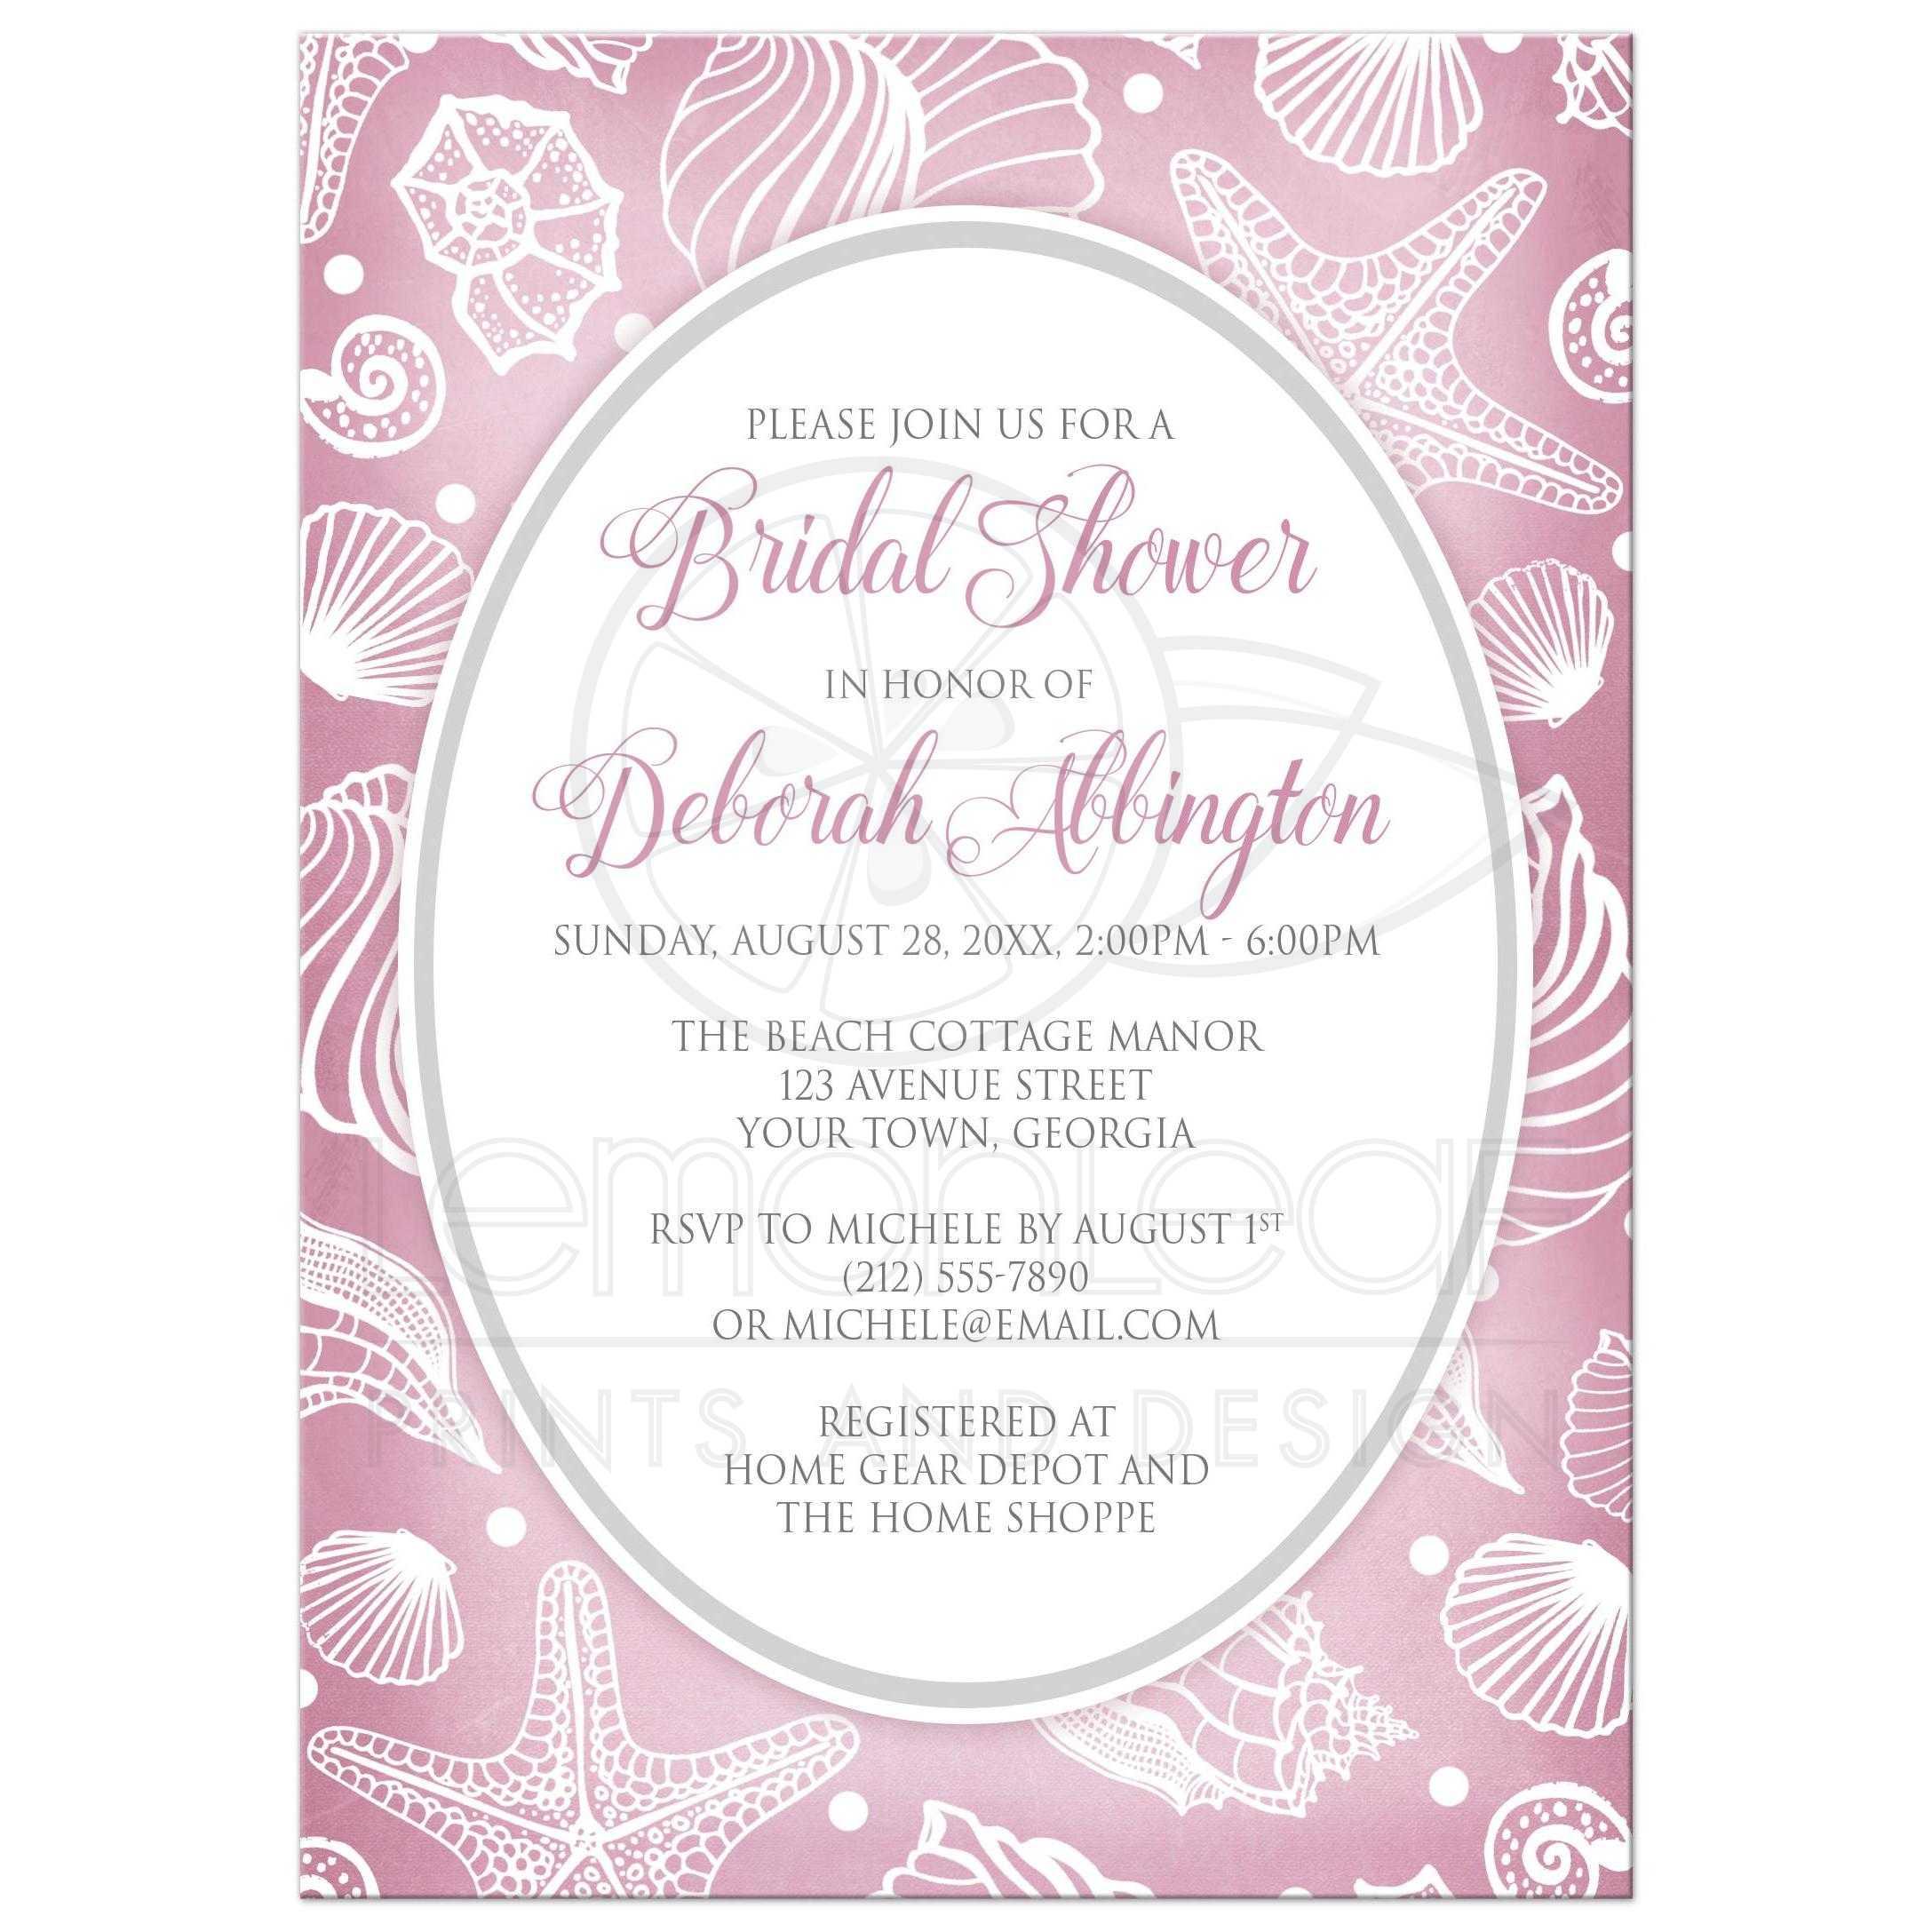 Bridal shower invitations pretty pink beach white seashell filmwisefo